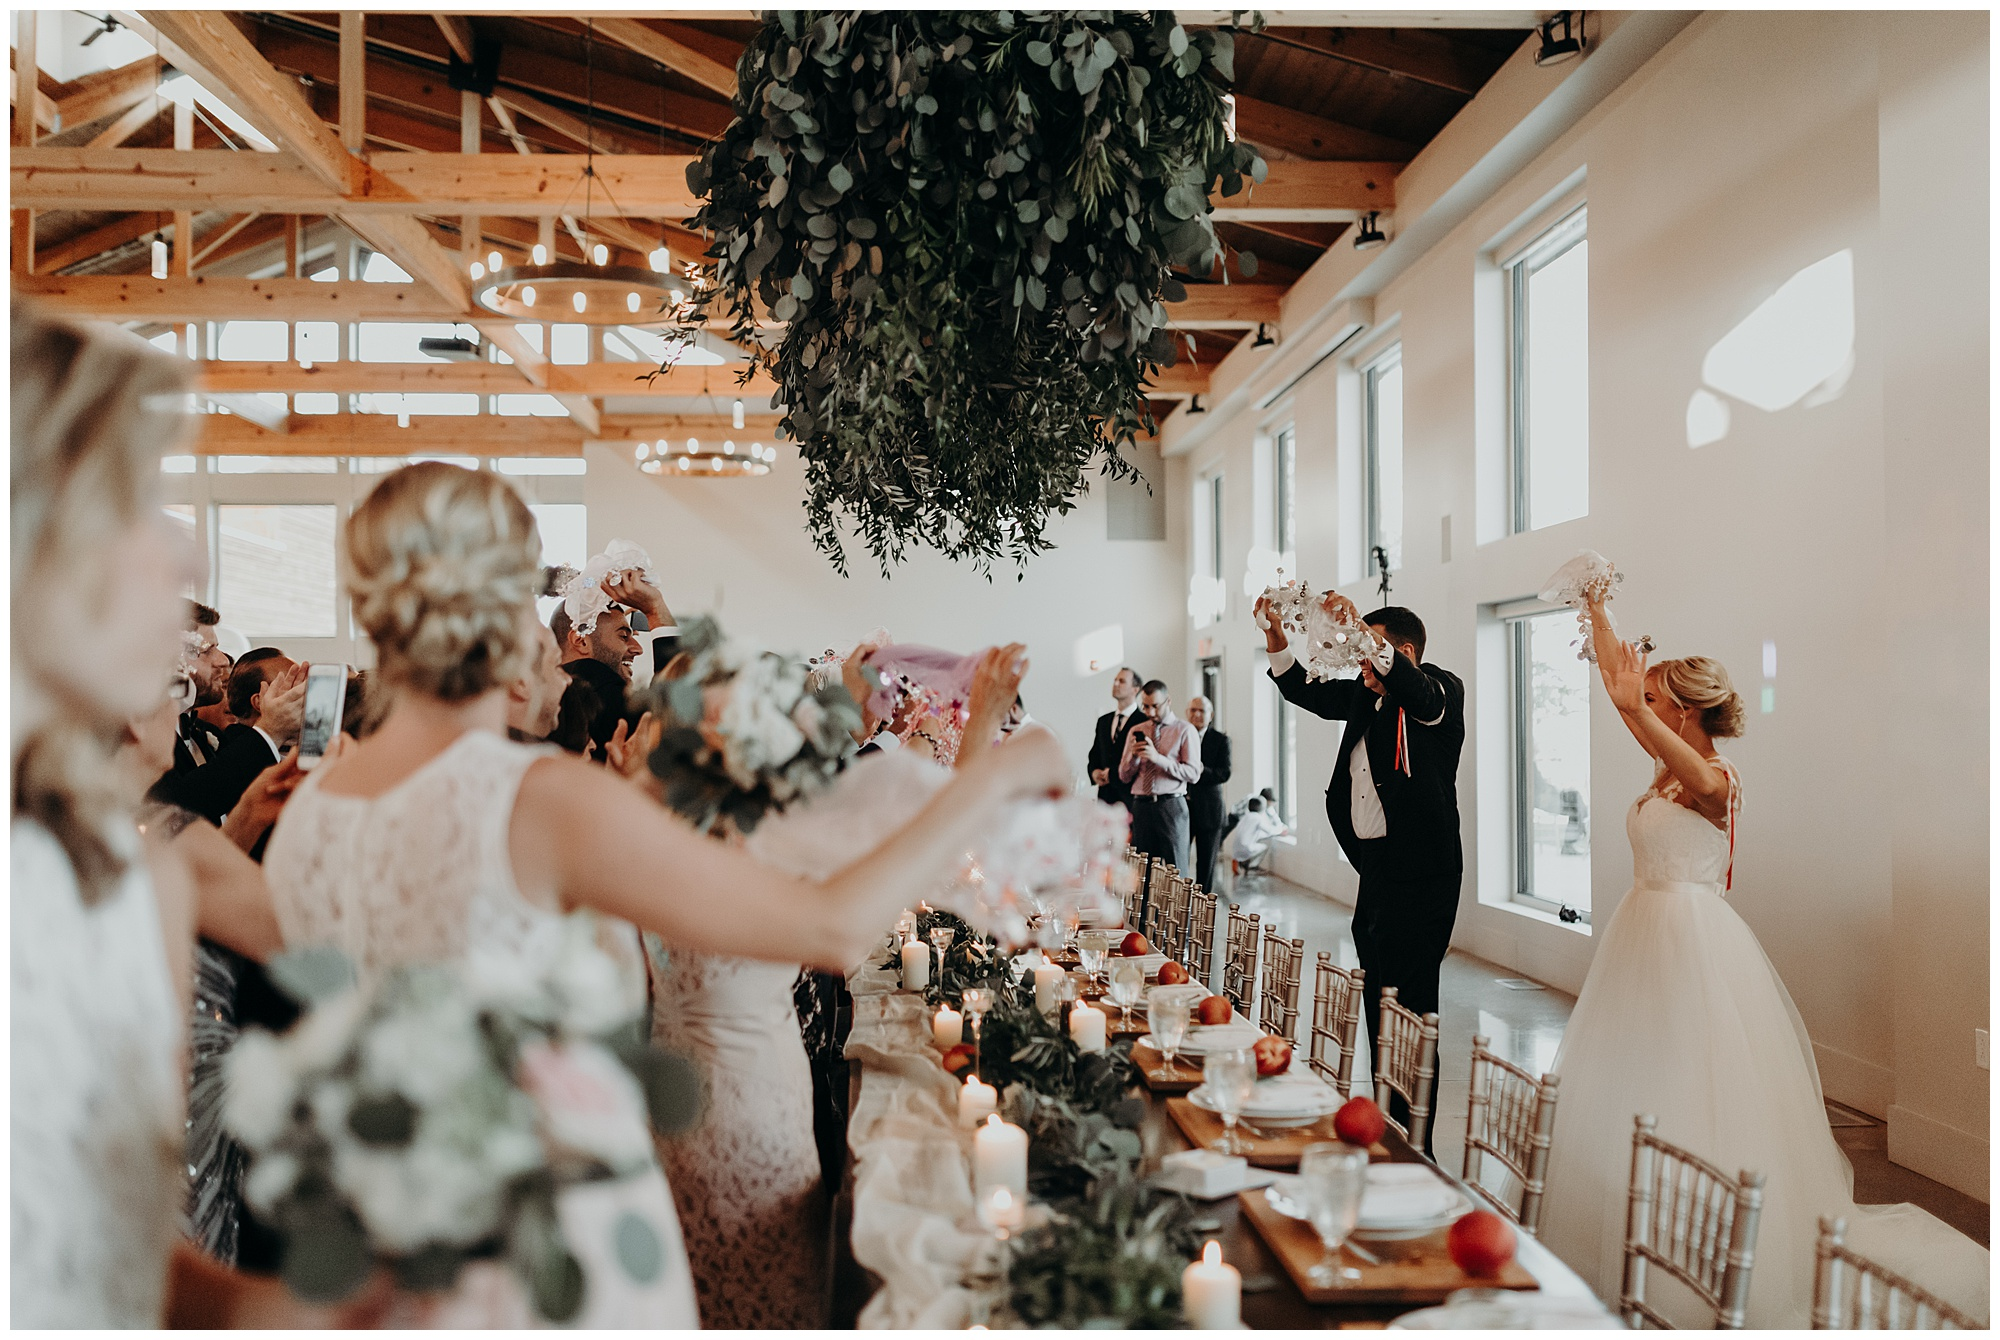 pear_tree_estate_wedding_champaign_il_wright_photographs_jj_0100.jpg